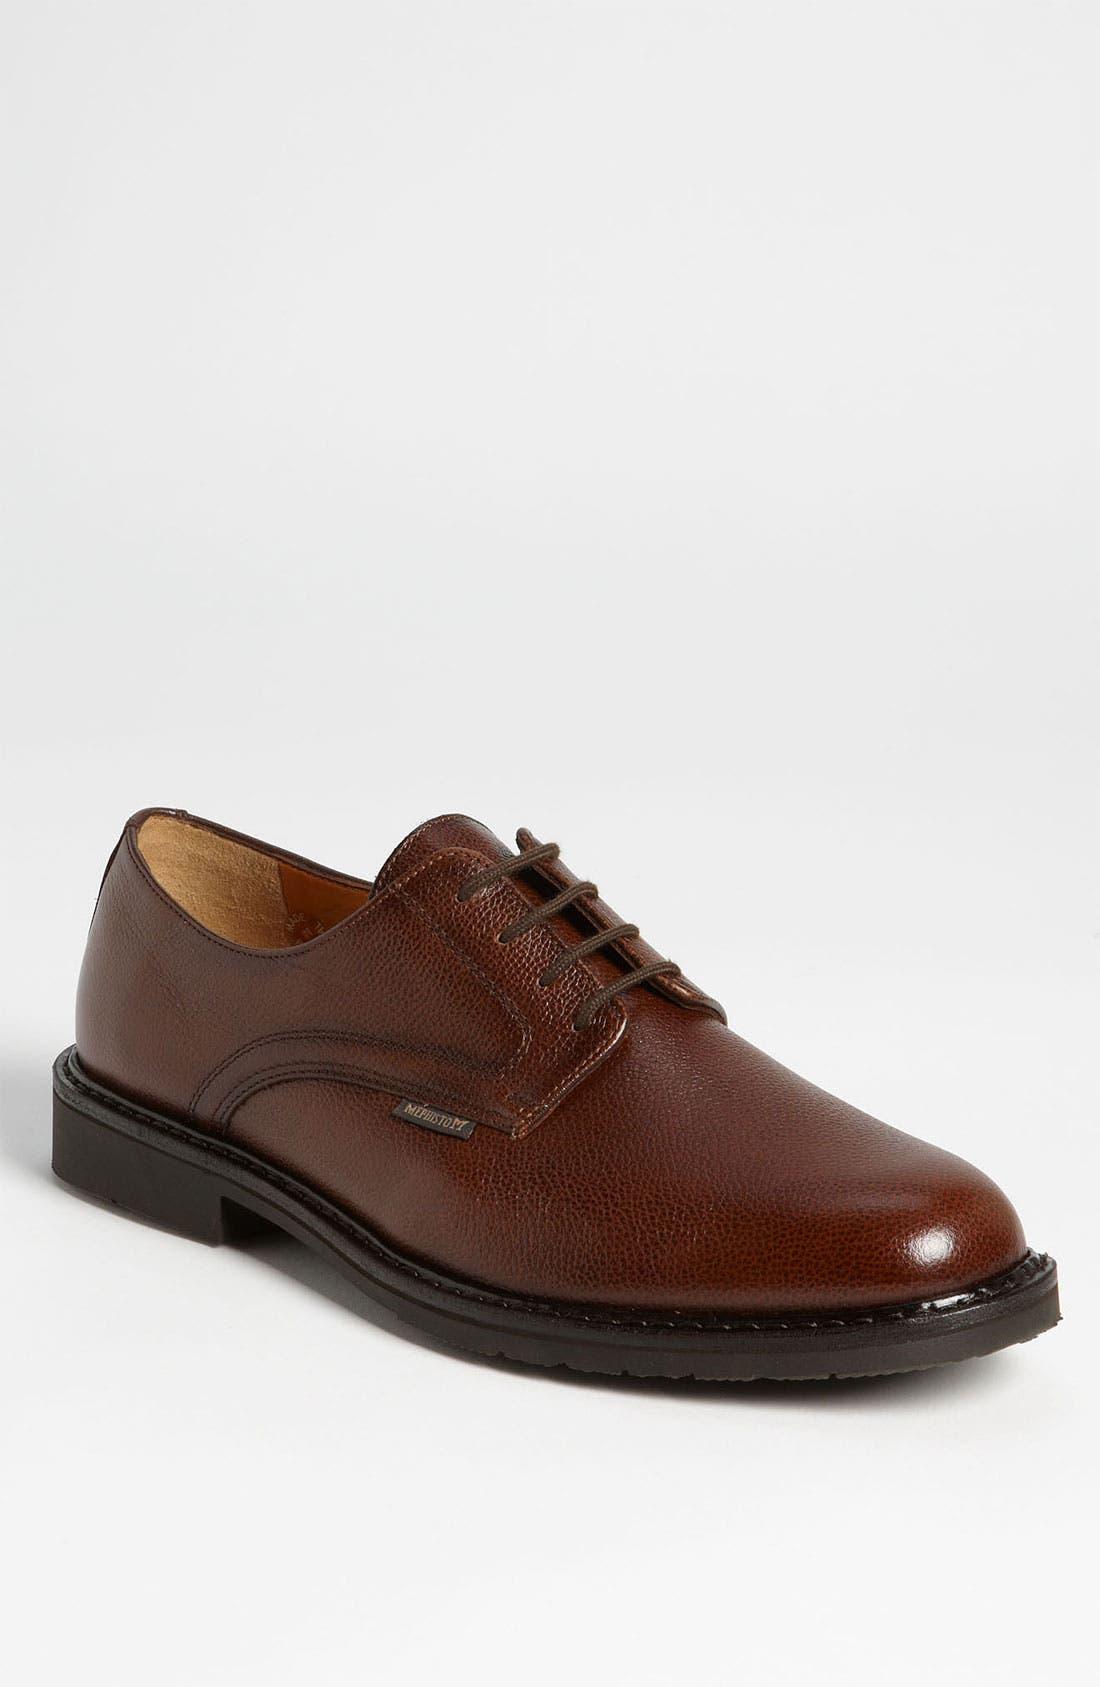 44cc6580659 Men's Mephisto Oxfords & Derby Shoes   Nordstrom